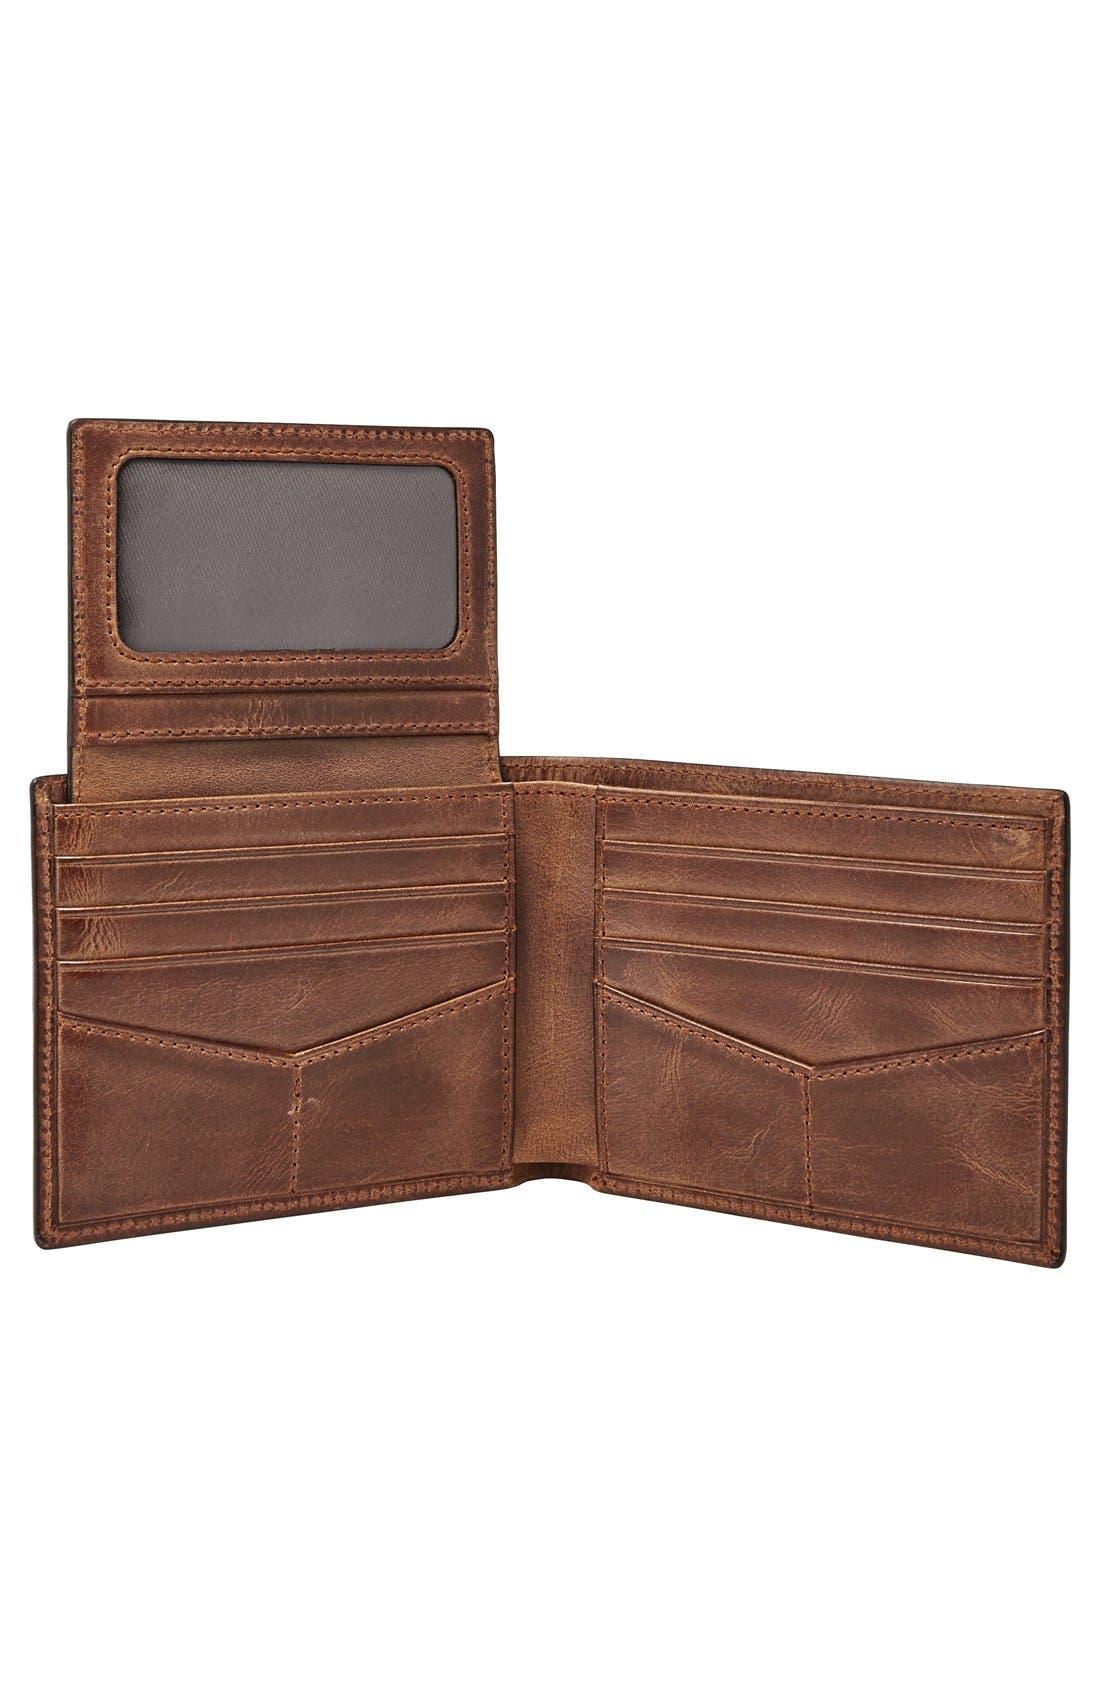 Alternate Image 2  - Fossil 'Derrick' Leather Flip Trifold Wallet